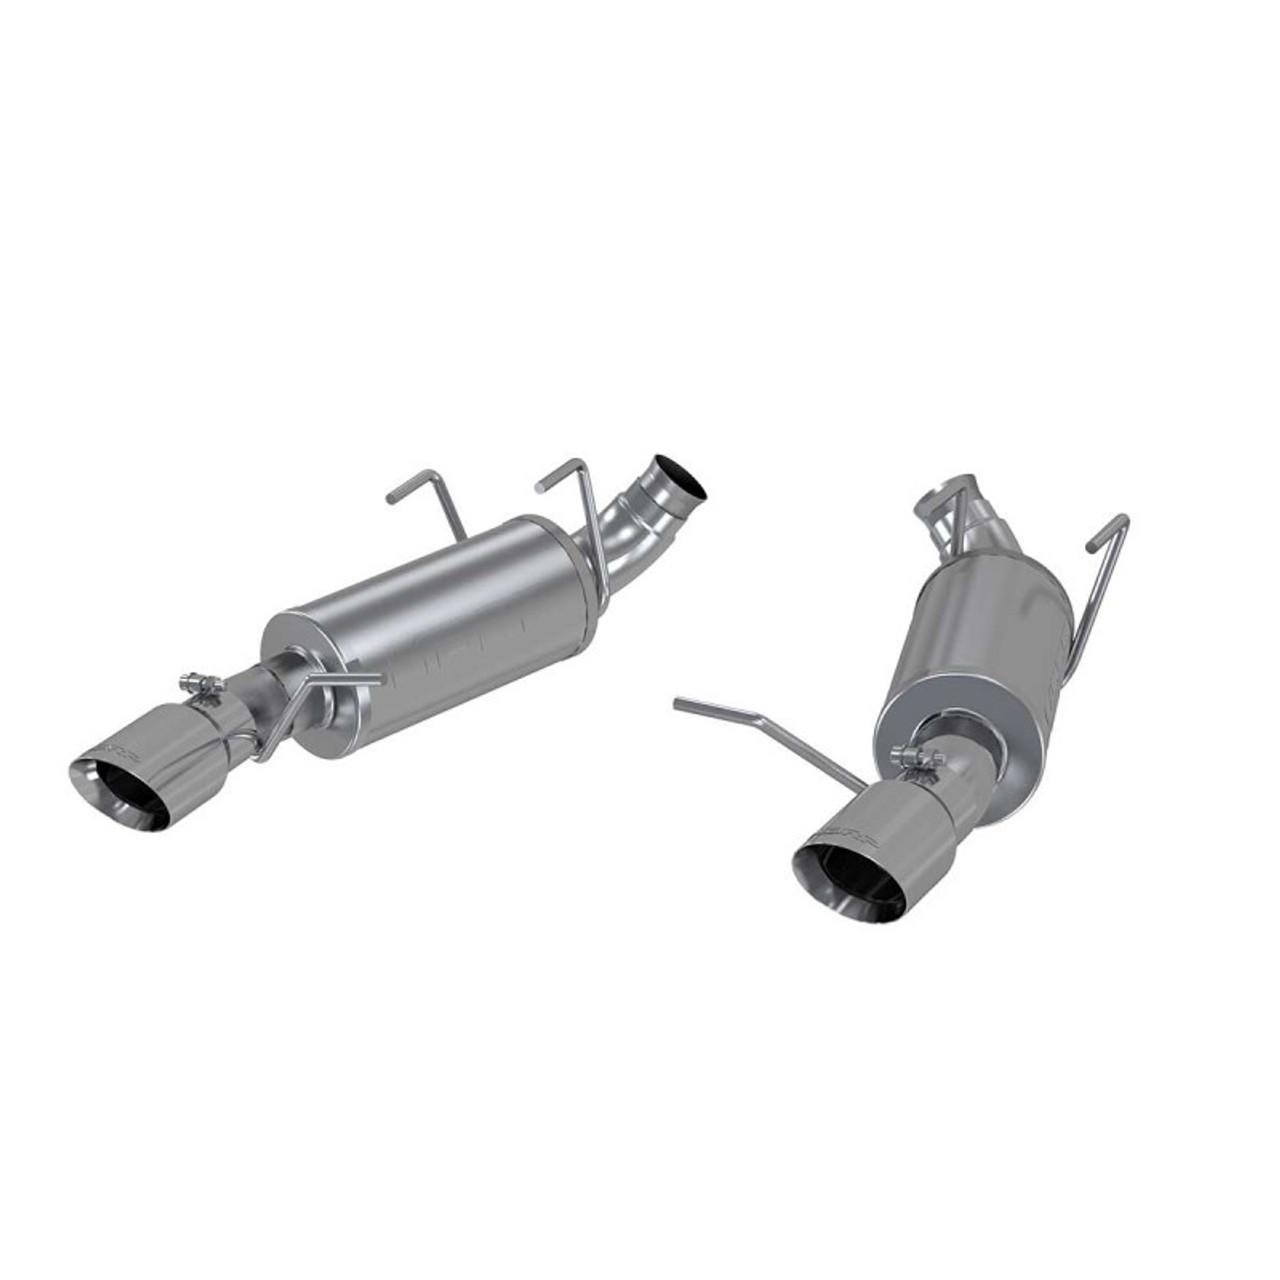 3 dual muffler axle back split rear 409 2011 2014 v6 3 7l mustang